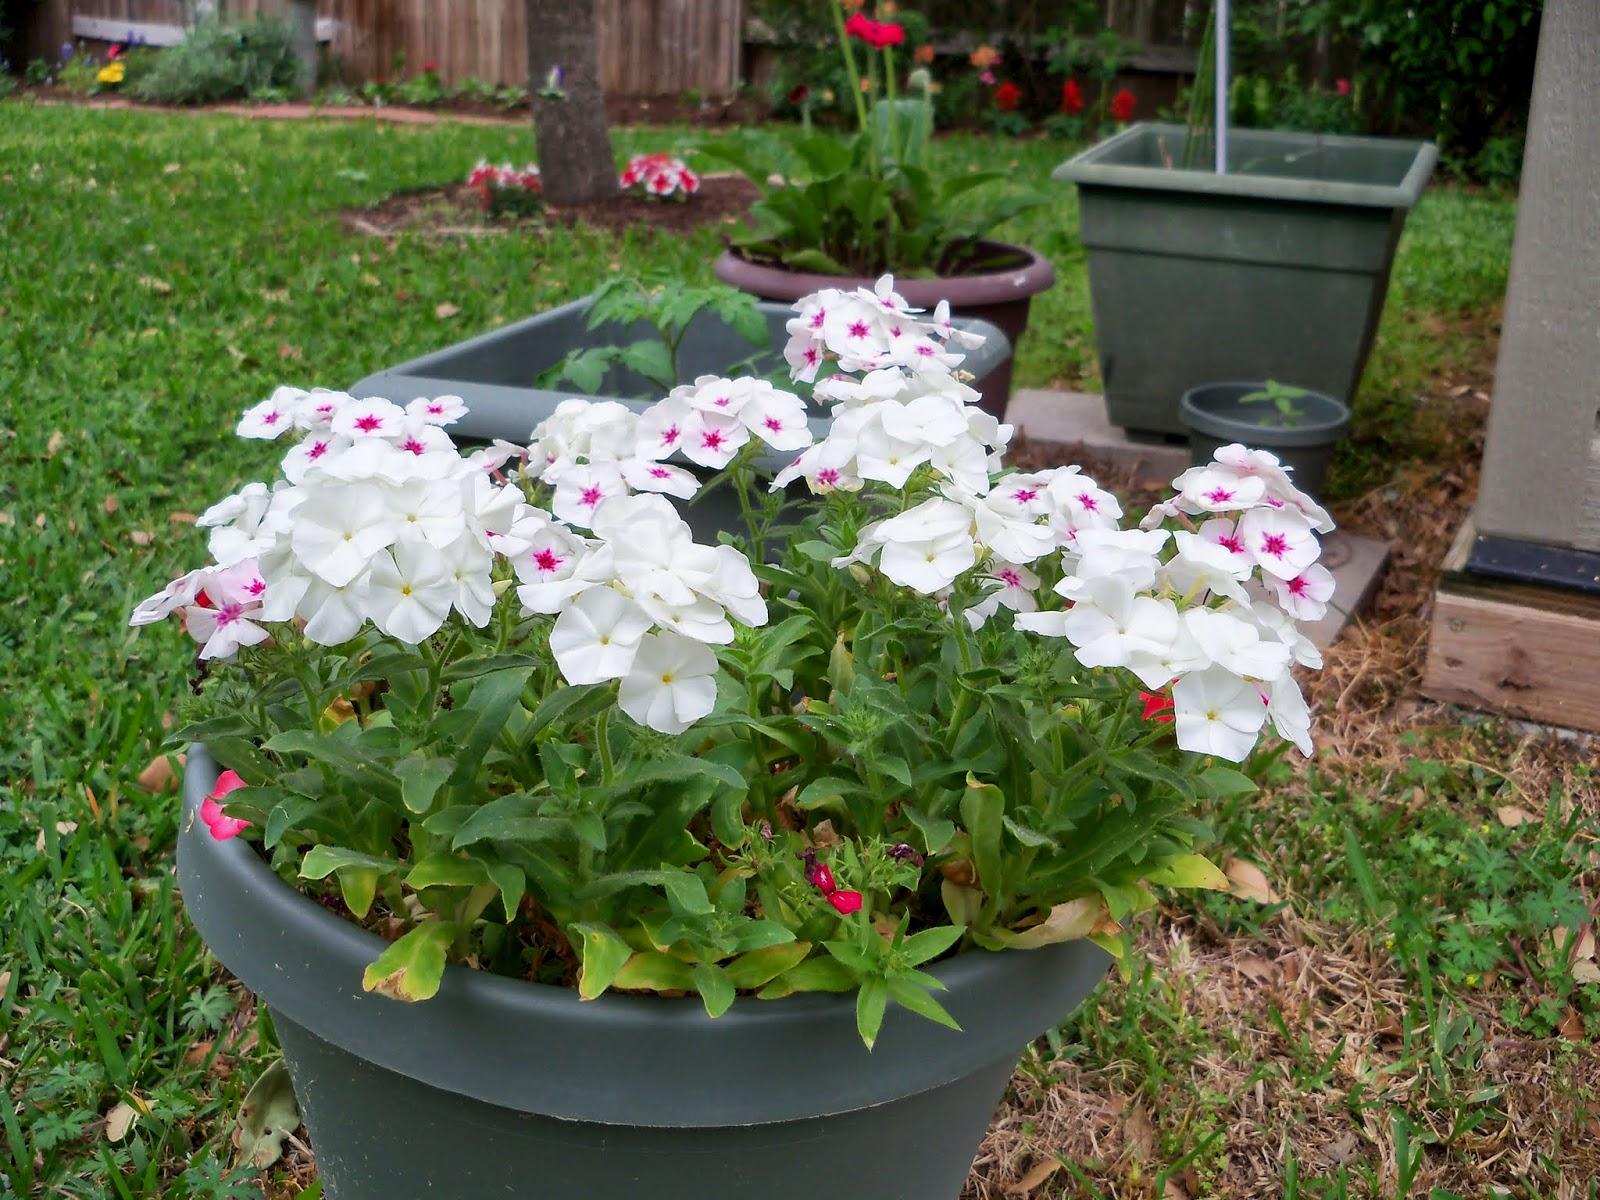 Gardening 2014 - 116_1249.JPG